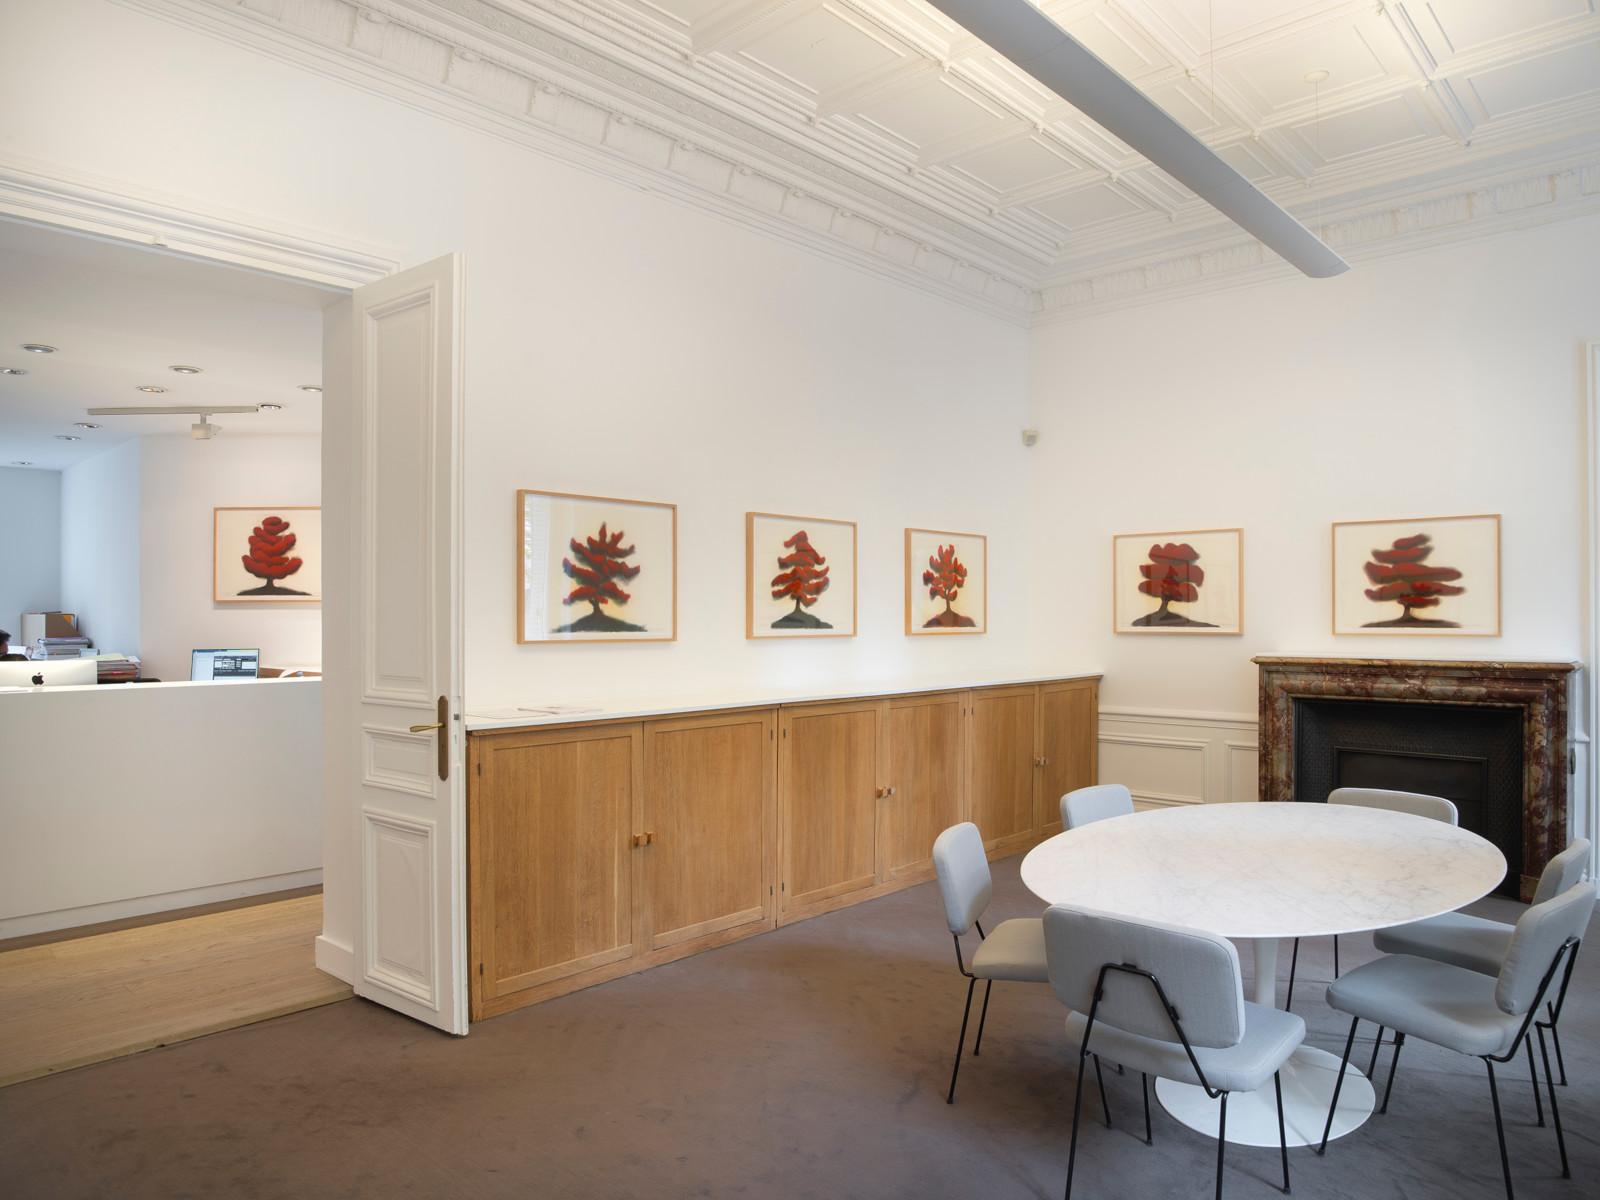 Galerie Lelong David Nash 1